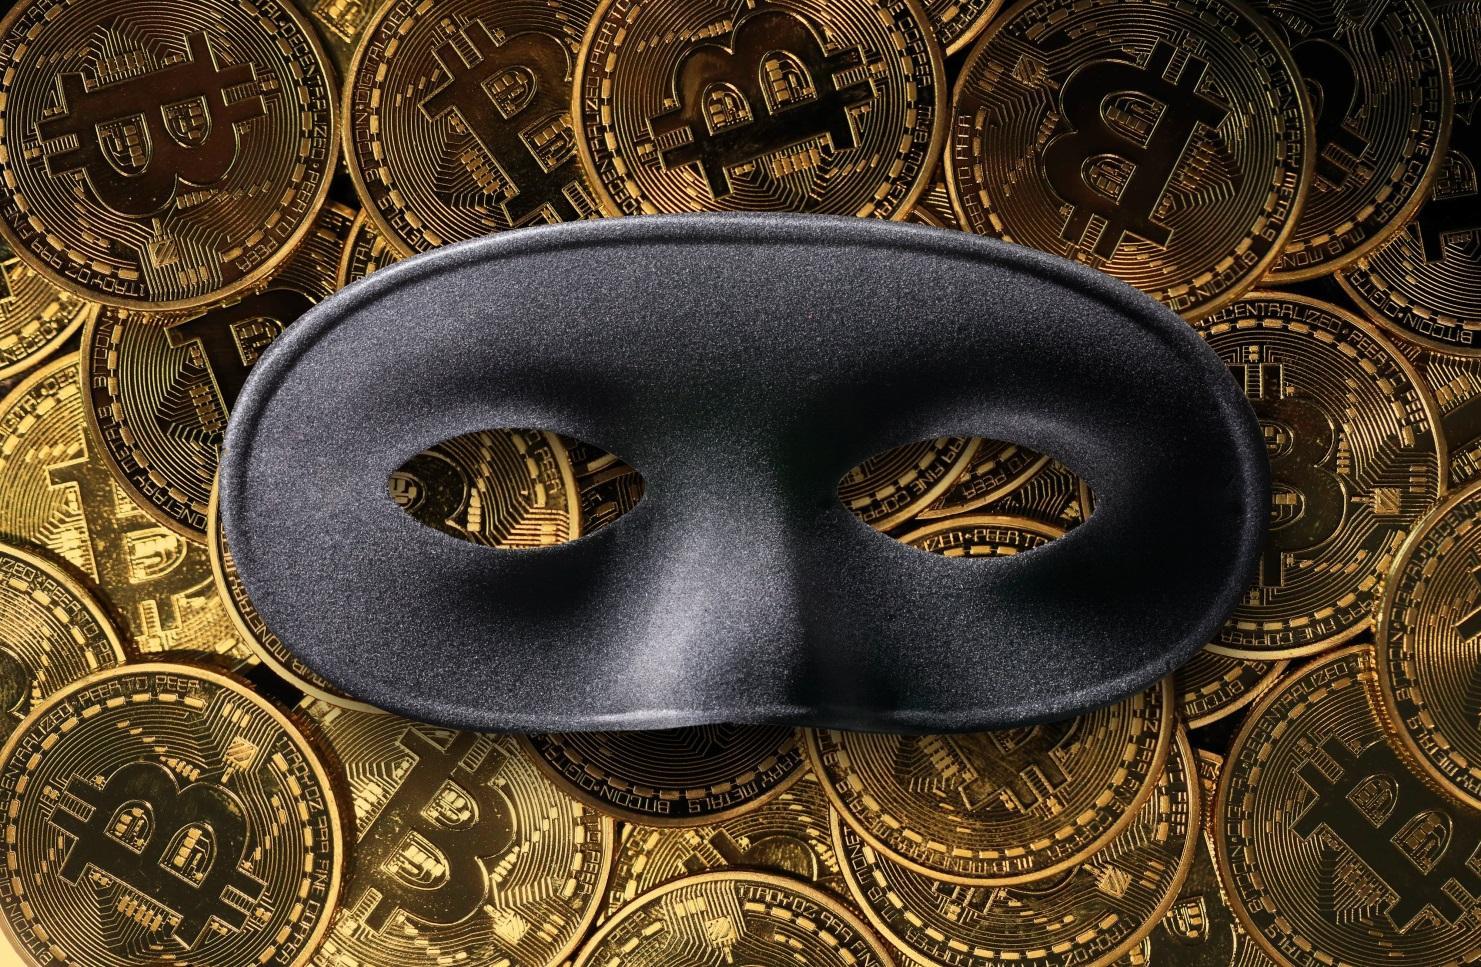 The original creator of Bitcoin is Satoshi Nakamoto